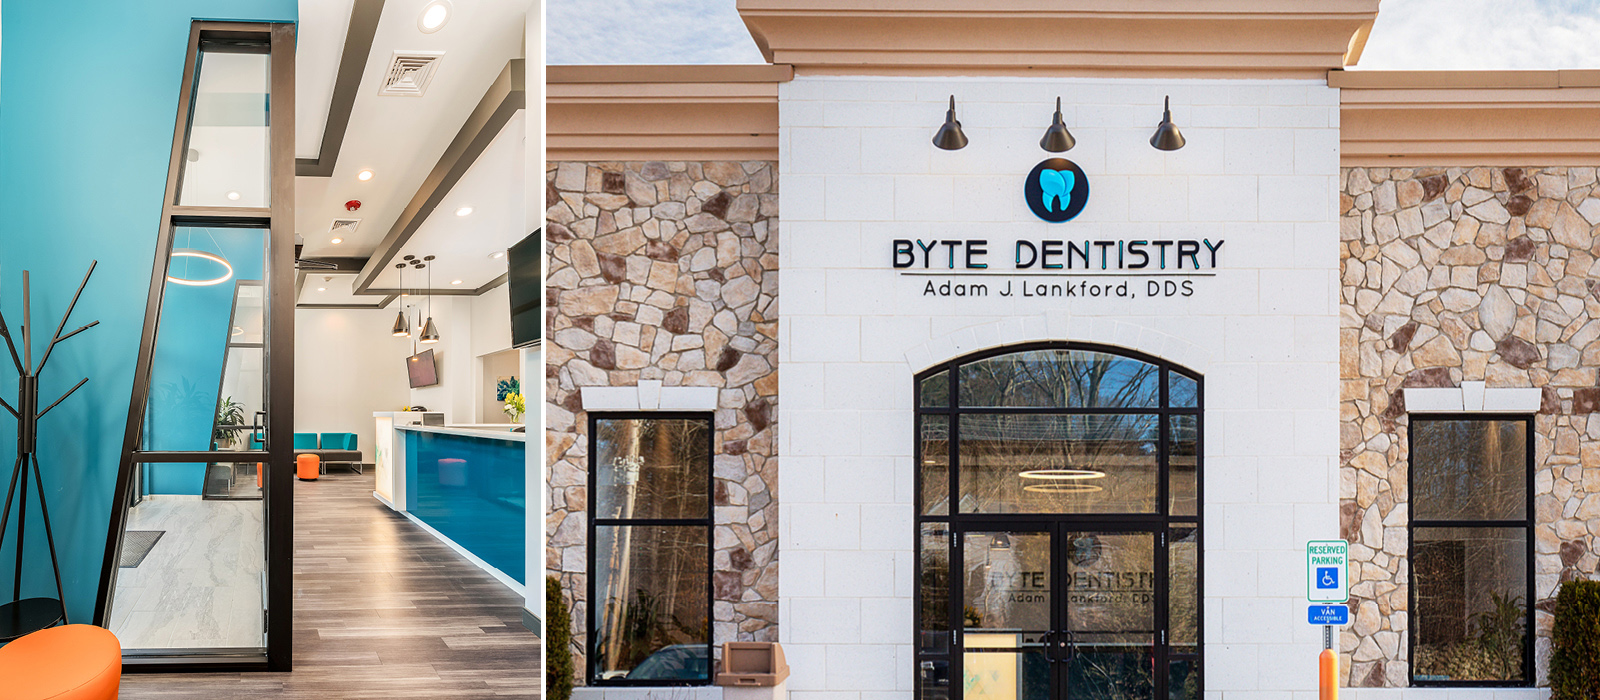 Byte Dentistry front entrance